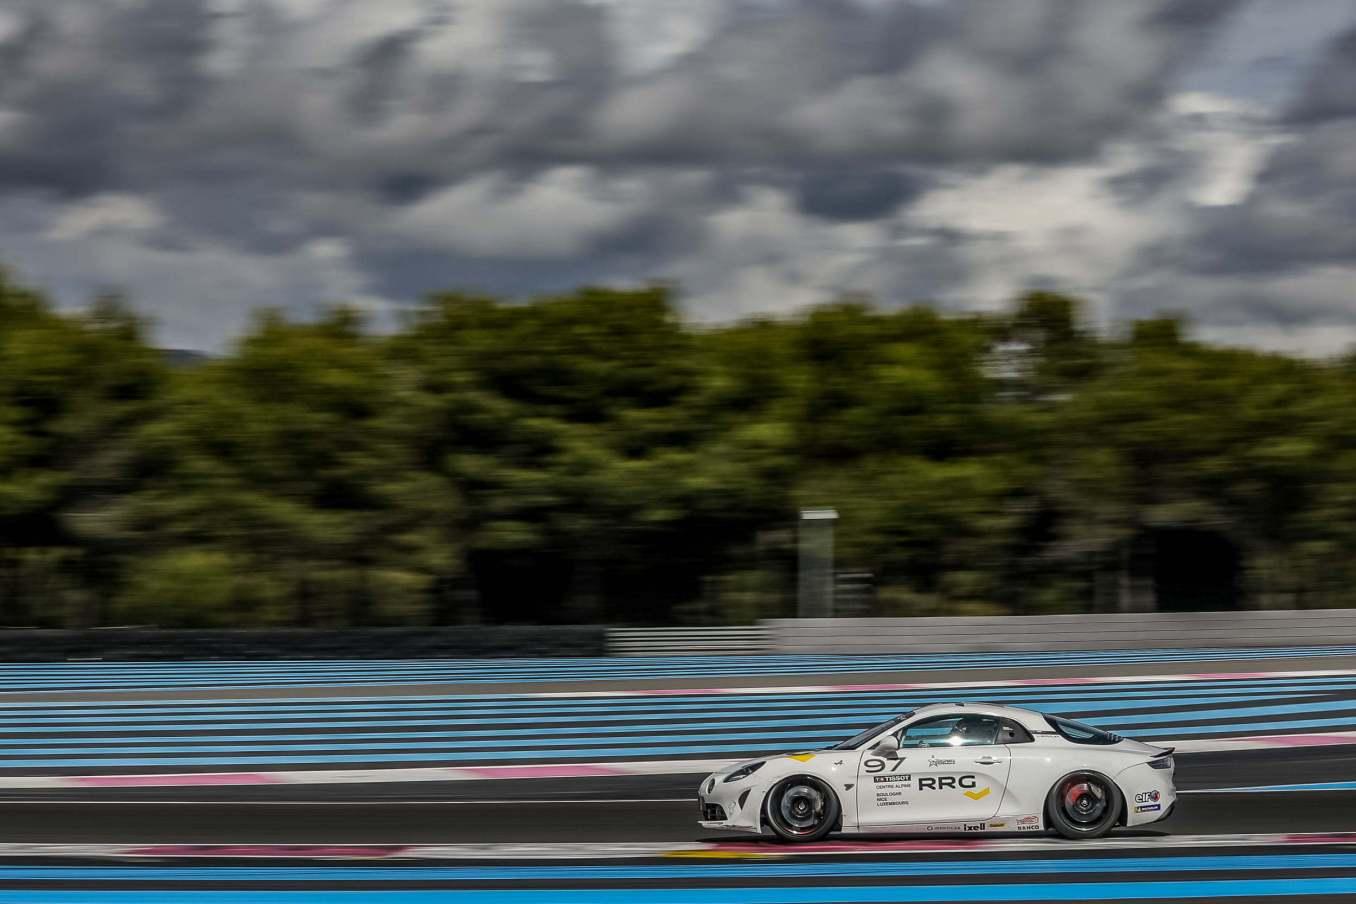 Autosport GP Leo Boulay Paul Ricard 2020 | Alpine Elf Europa Cup 2020 : L'équipe Autosport GP assurée du titre !